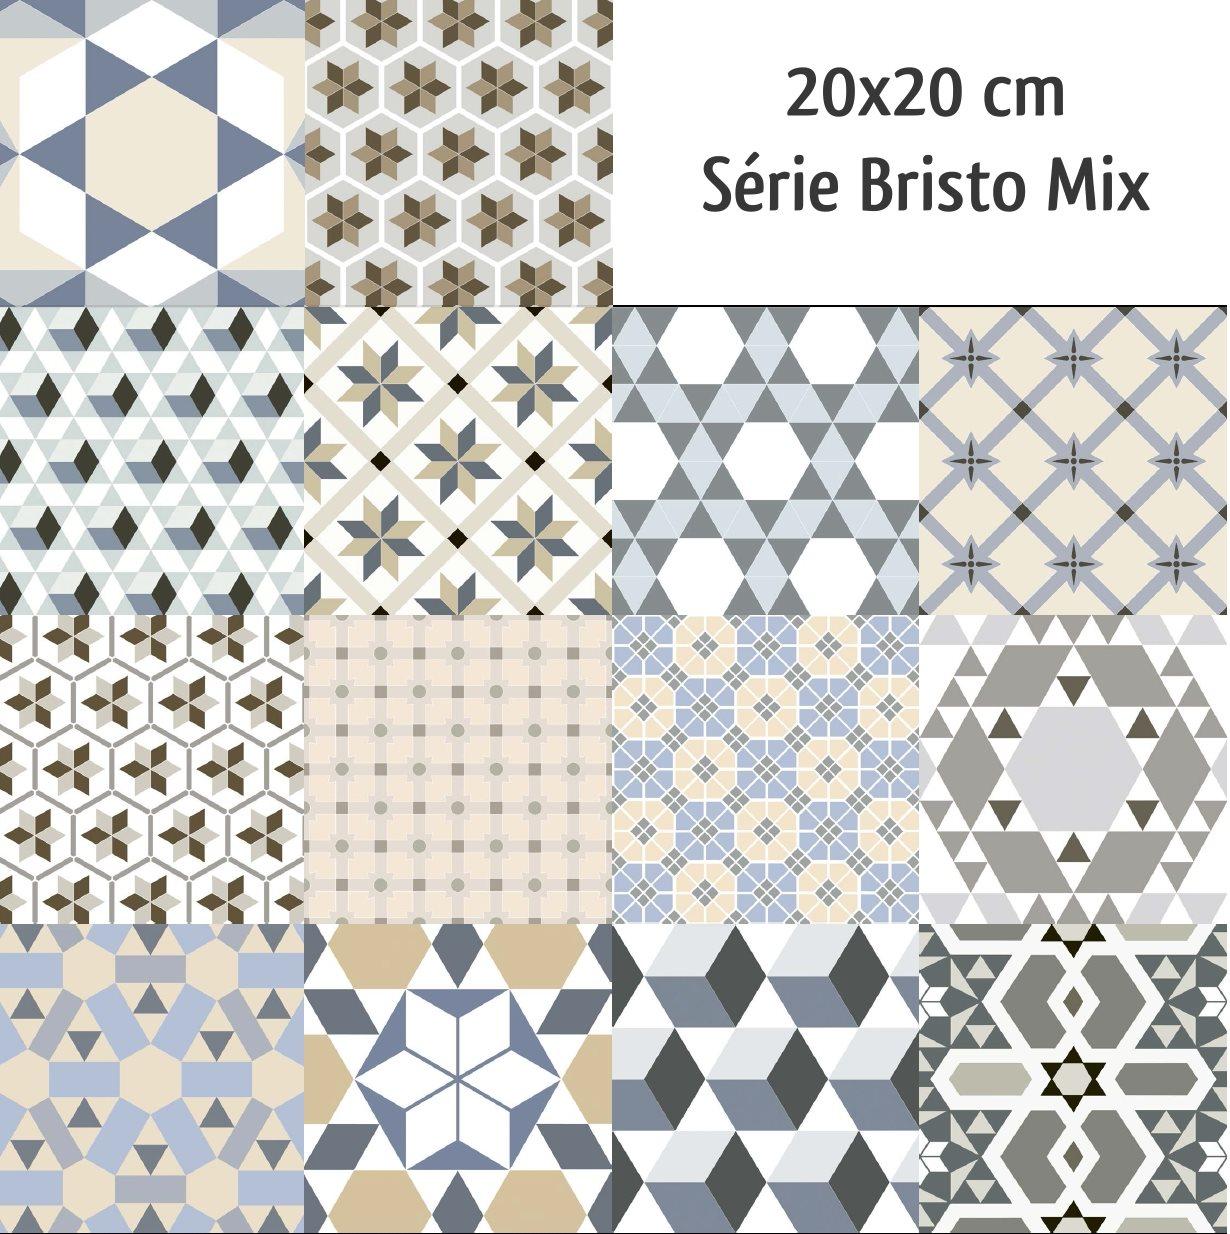 Carrelage imitation ciment mix 20x20 cm BISTRO - 1m² - zoom